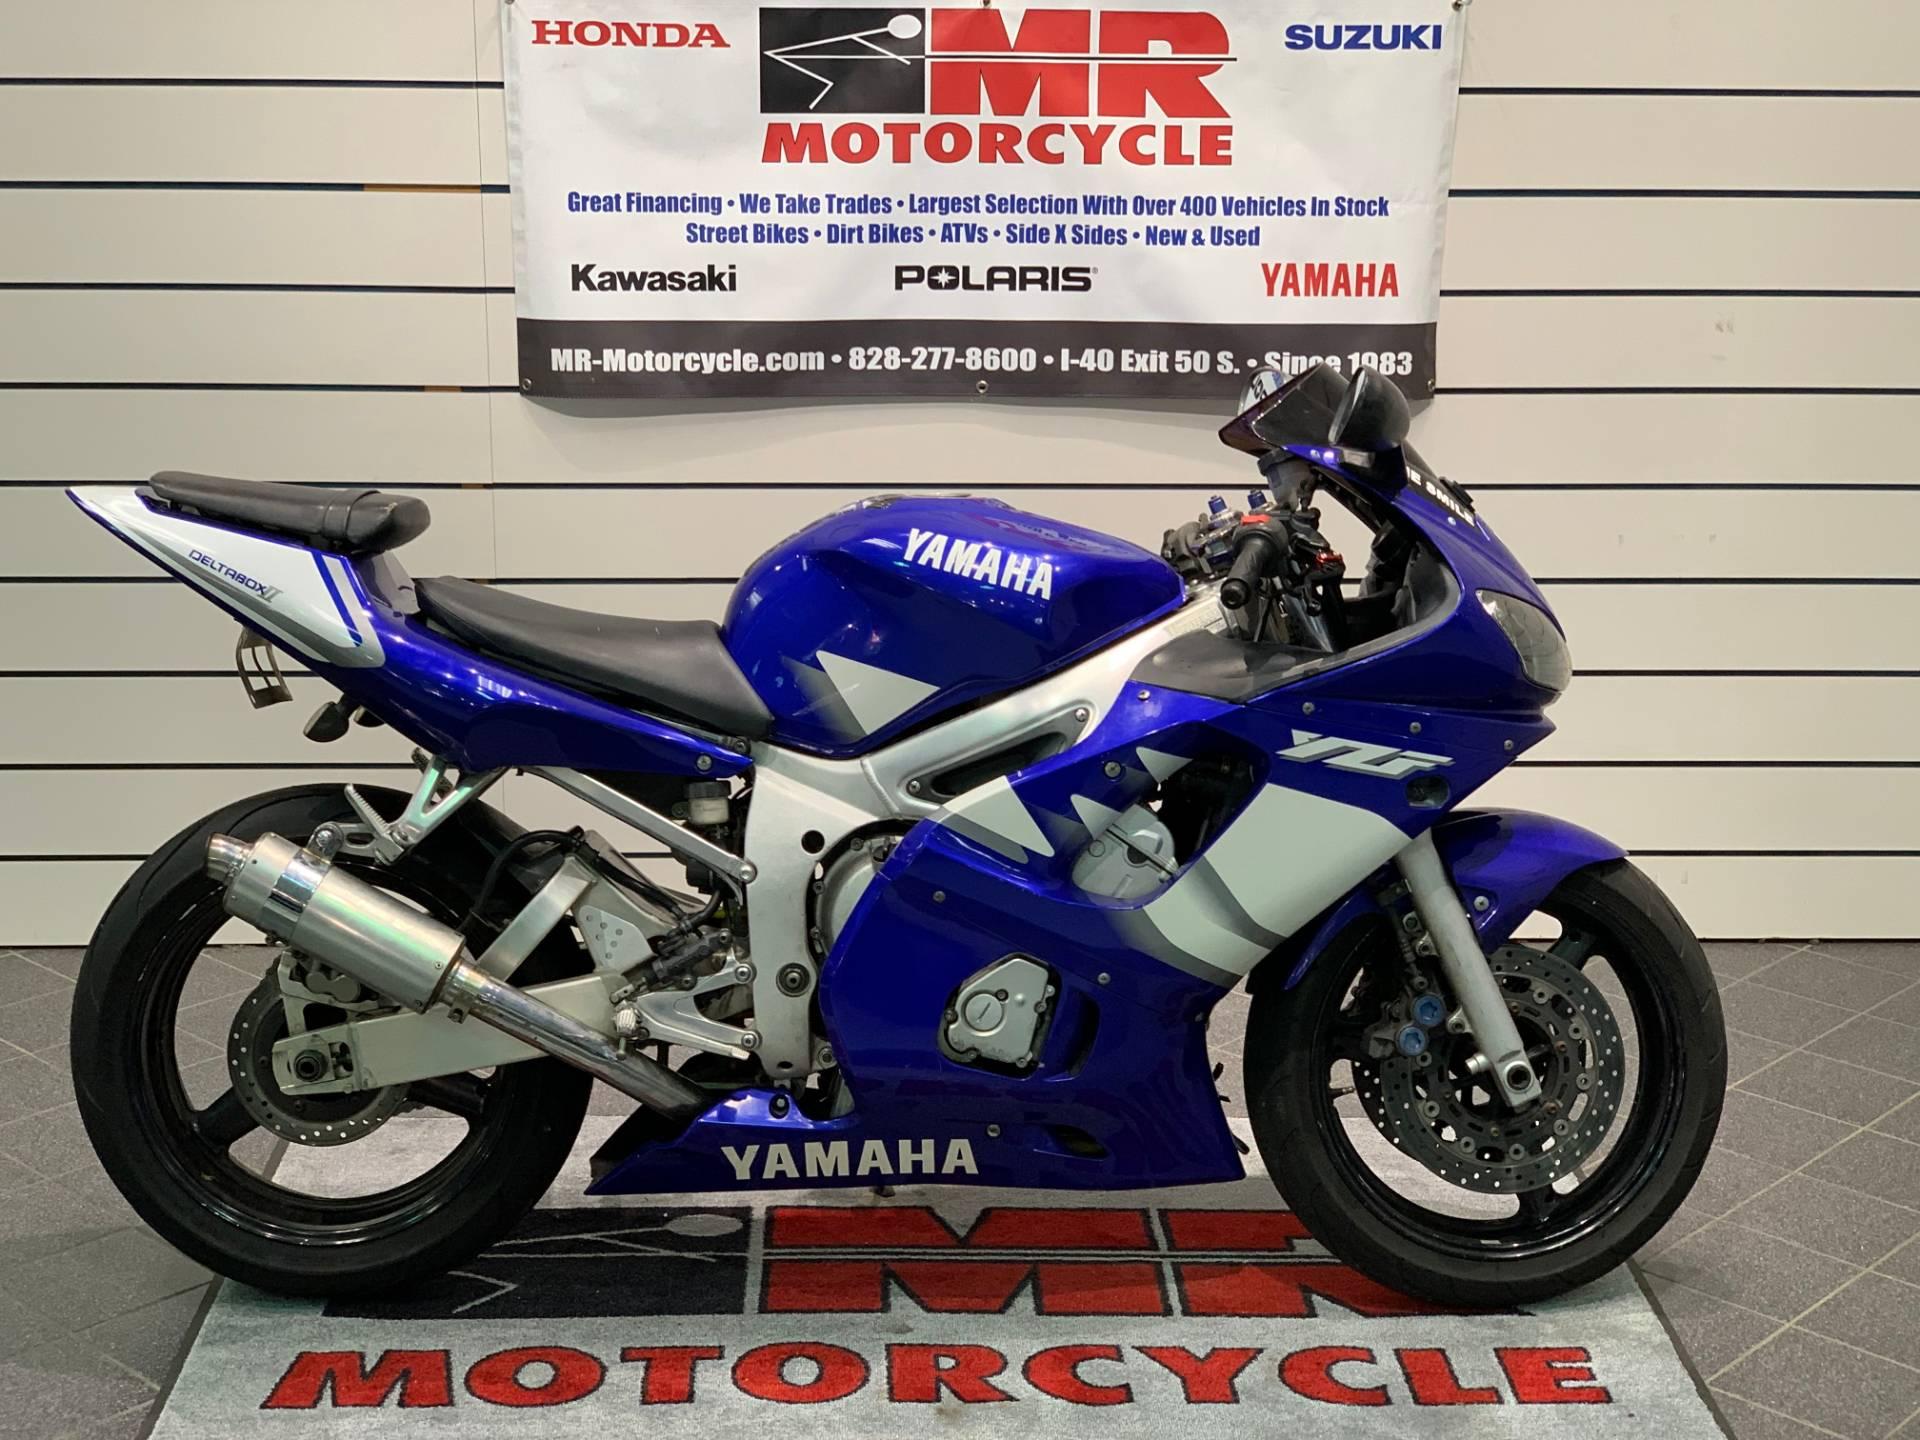 2000 Yamaha YZFR6 1